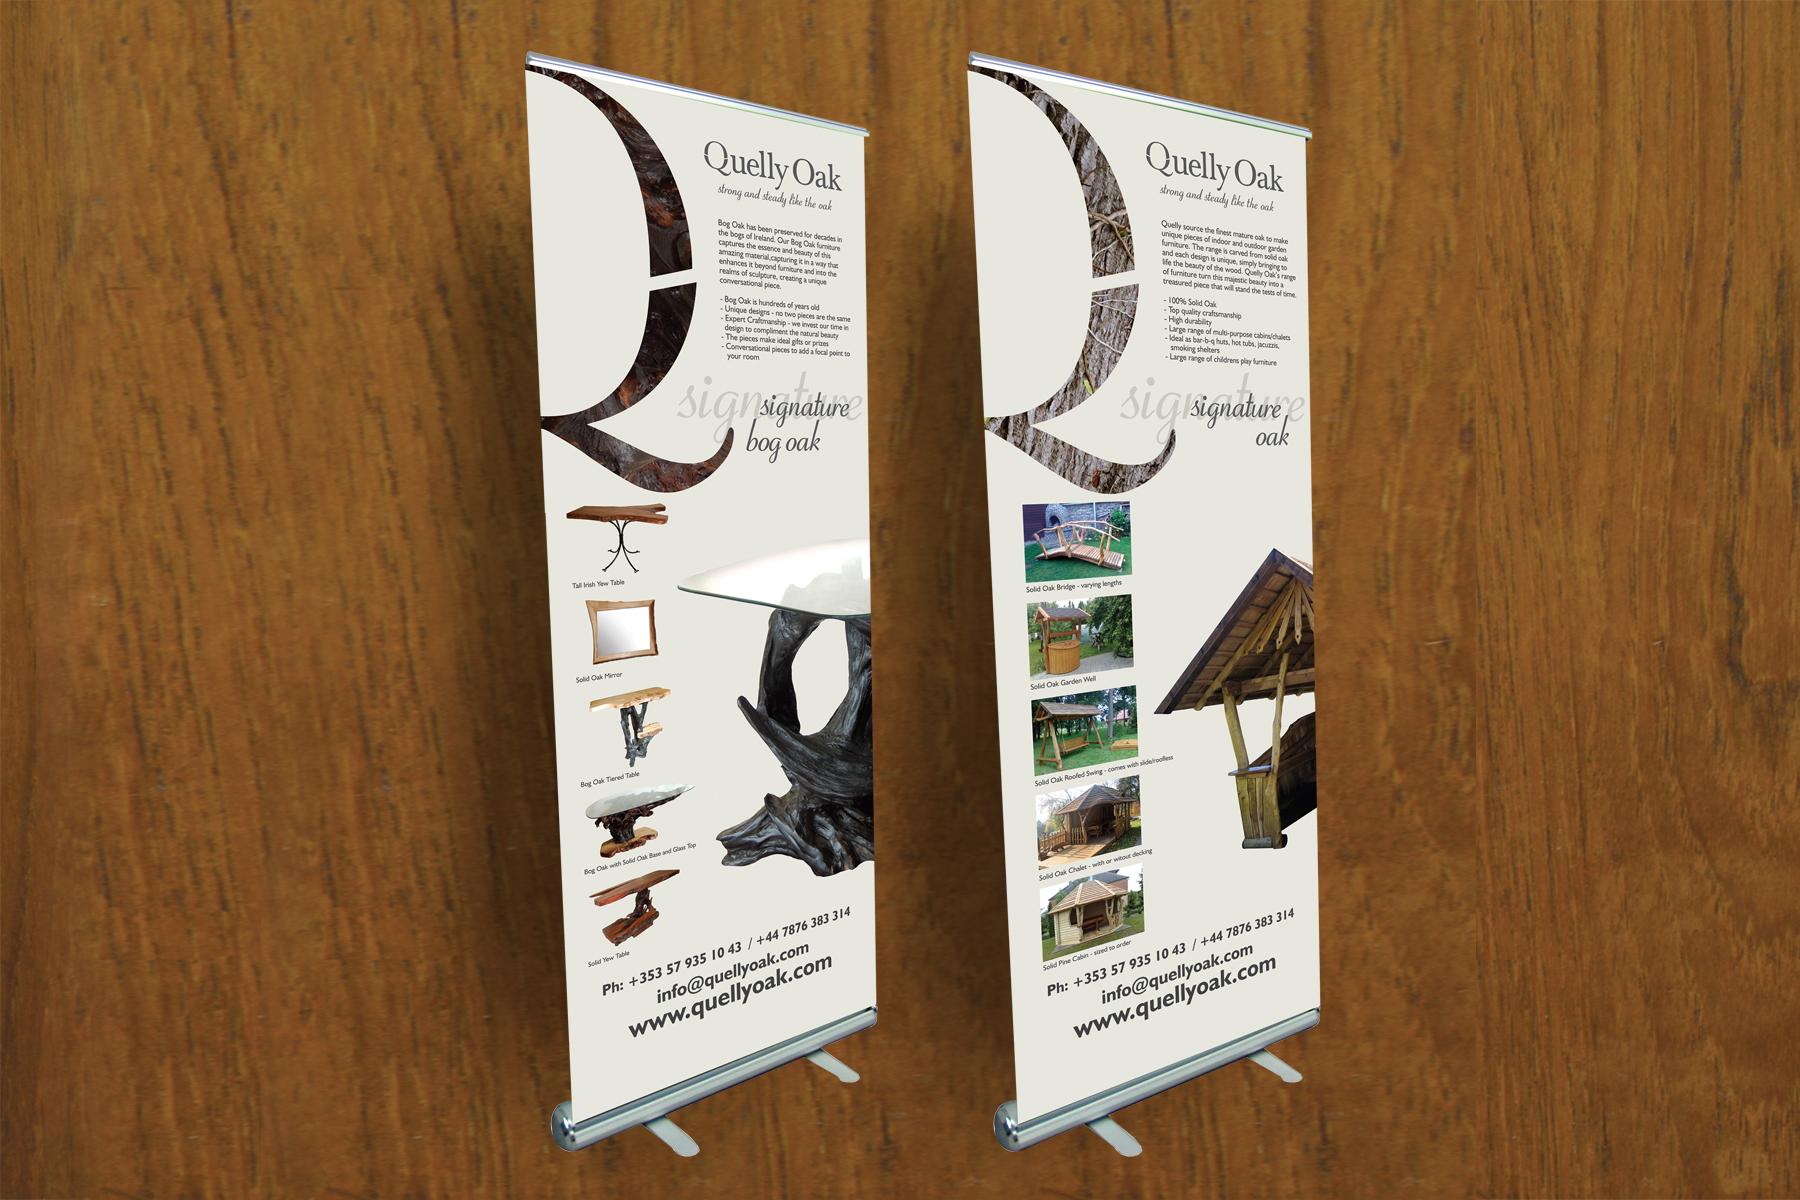 Quelly-banners.jpg